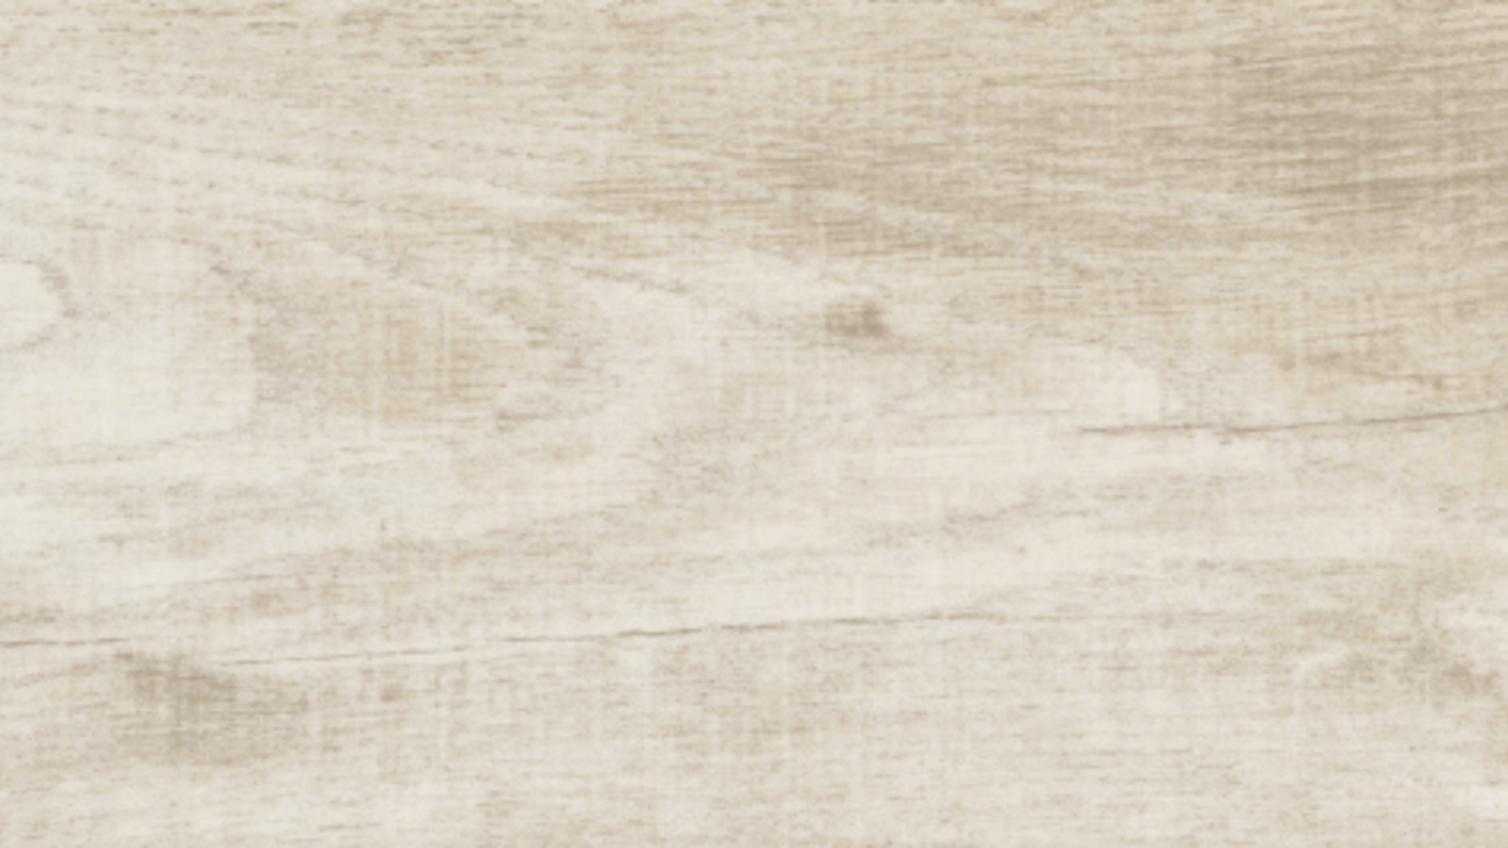 Howdens Professional Single Plank White Wash Oak Luxury